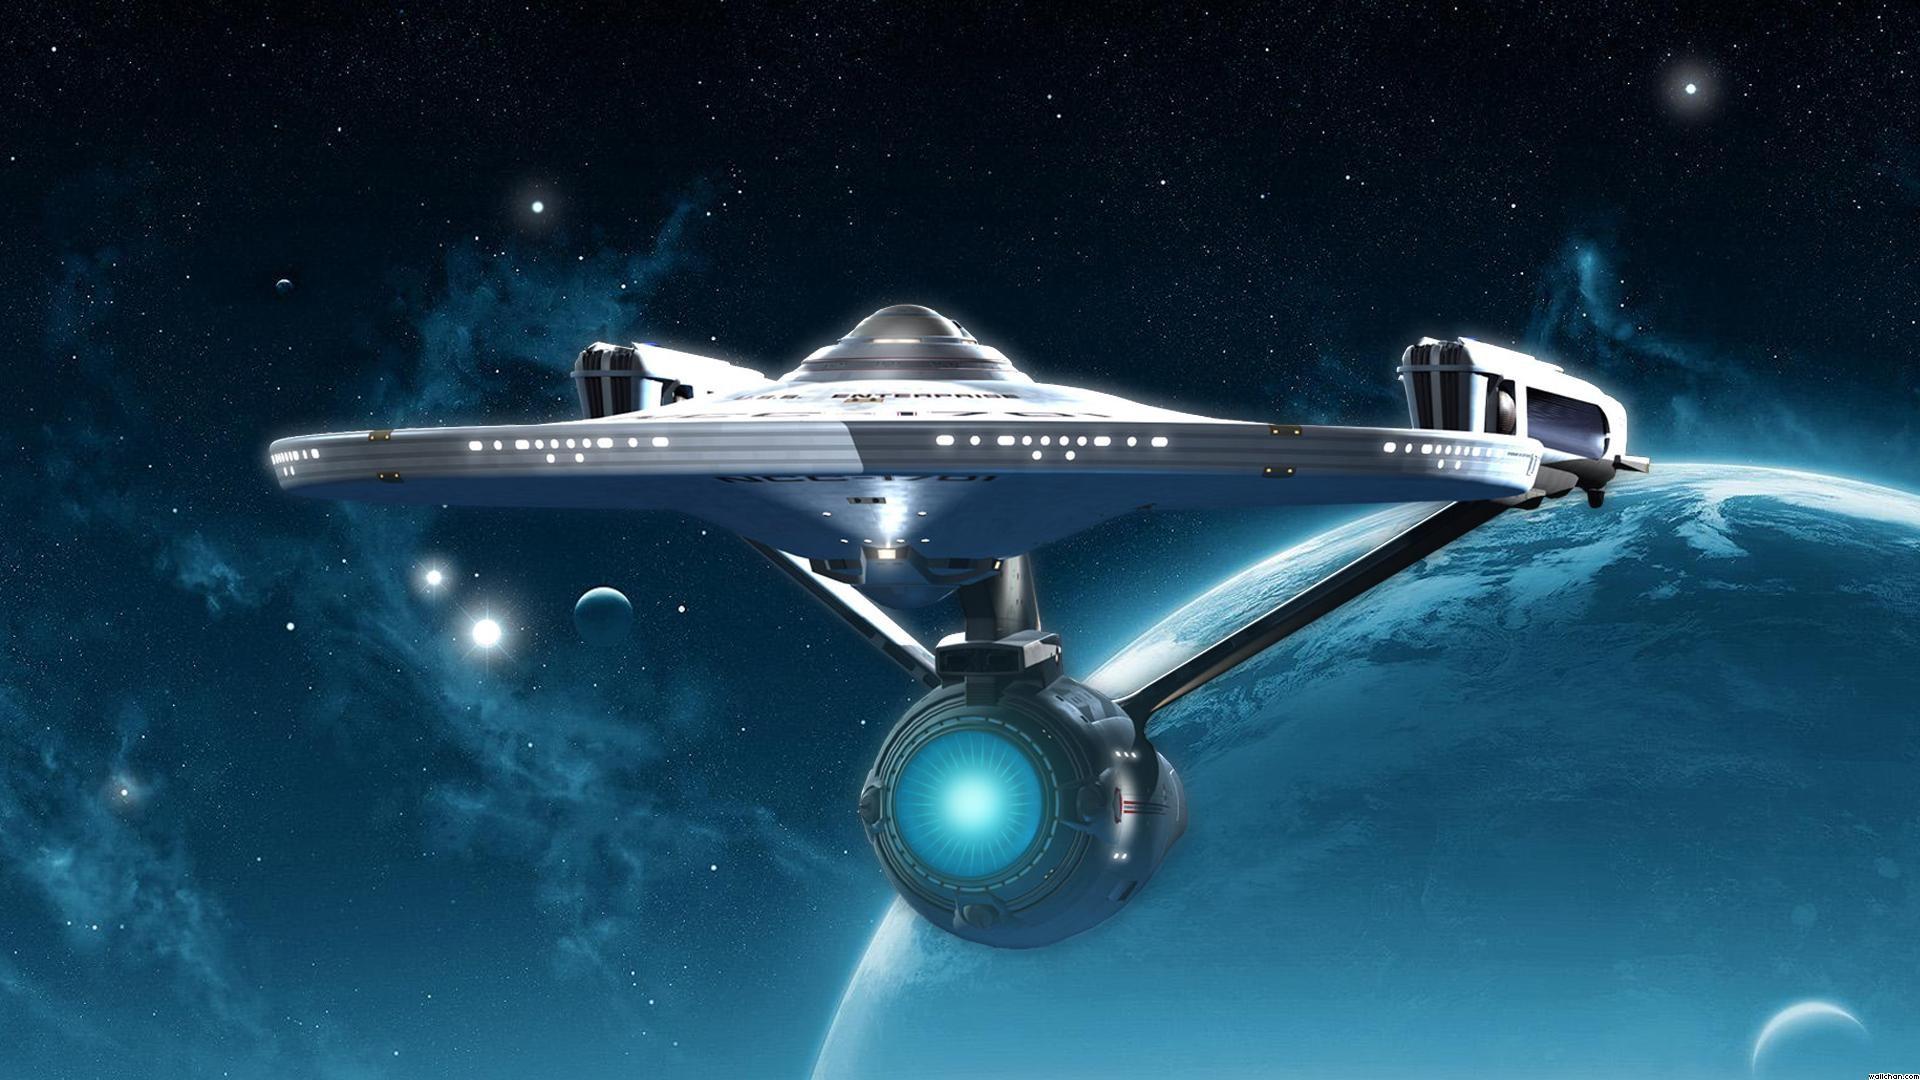 Star Trek Enterprise Wallpaper ·① WallpaperTag